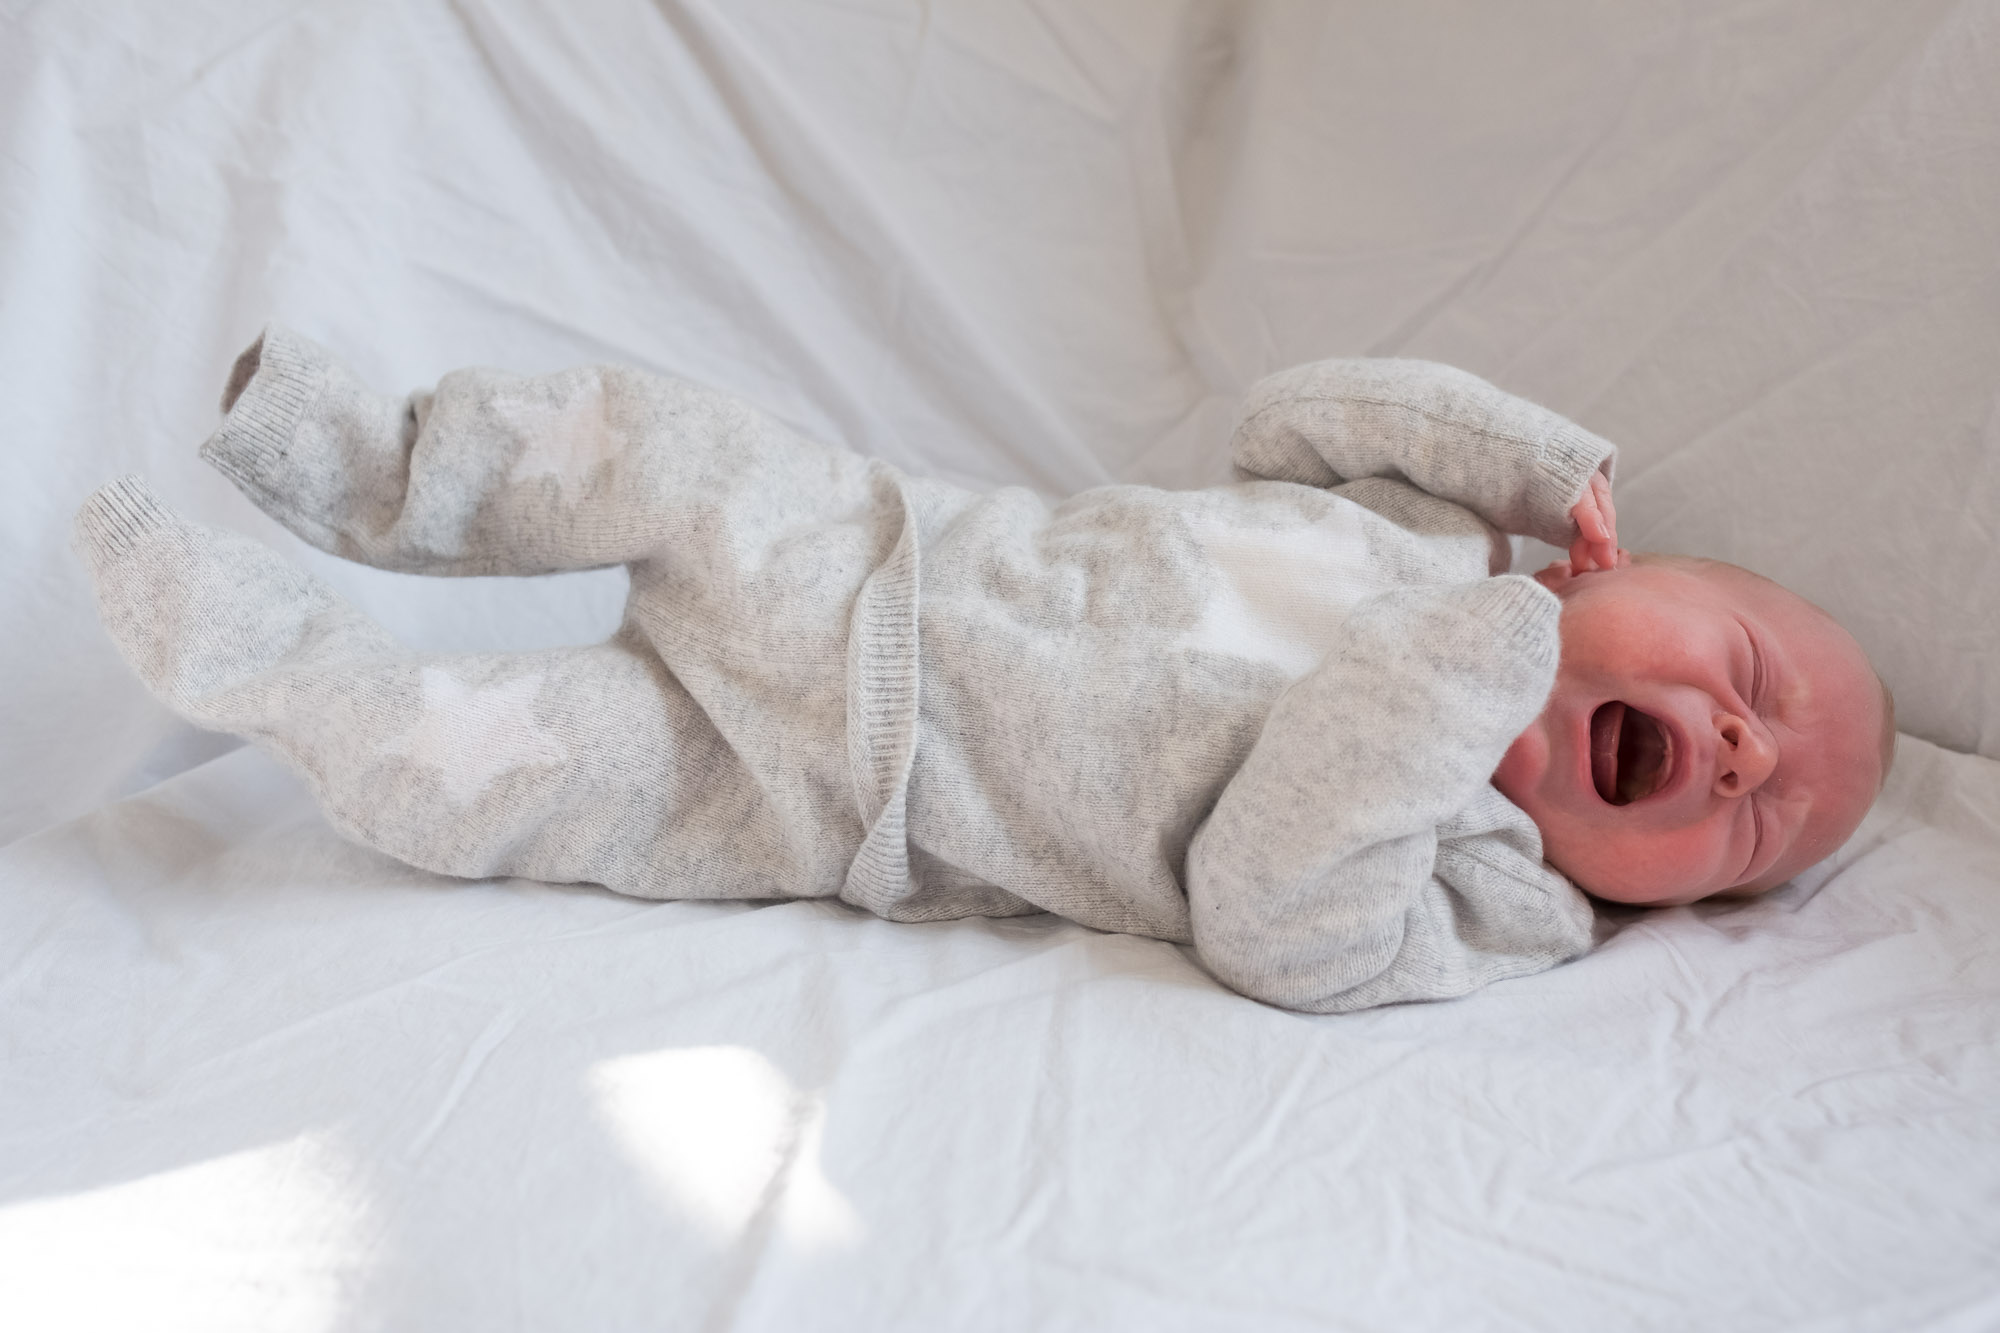 family-portrait-baby-photographer-084.jpg